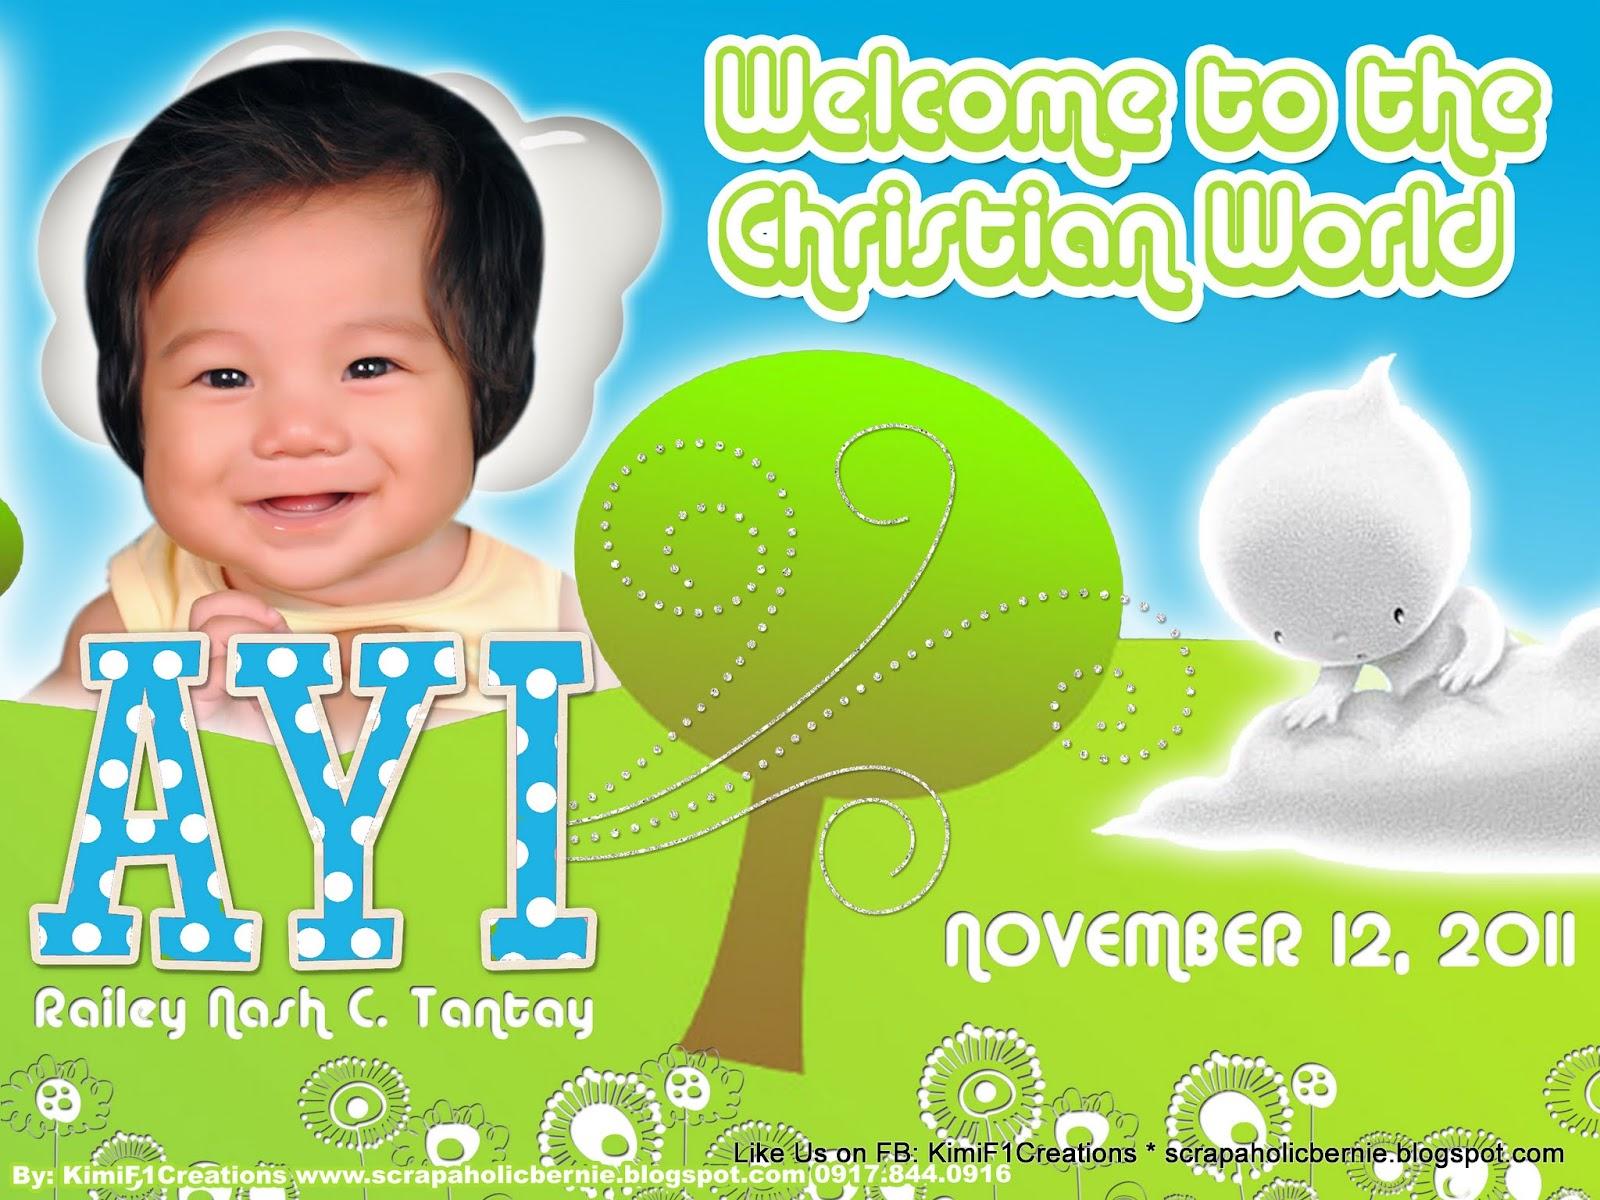 Another Free Baptismal Tarpaulin...